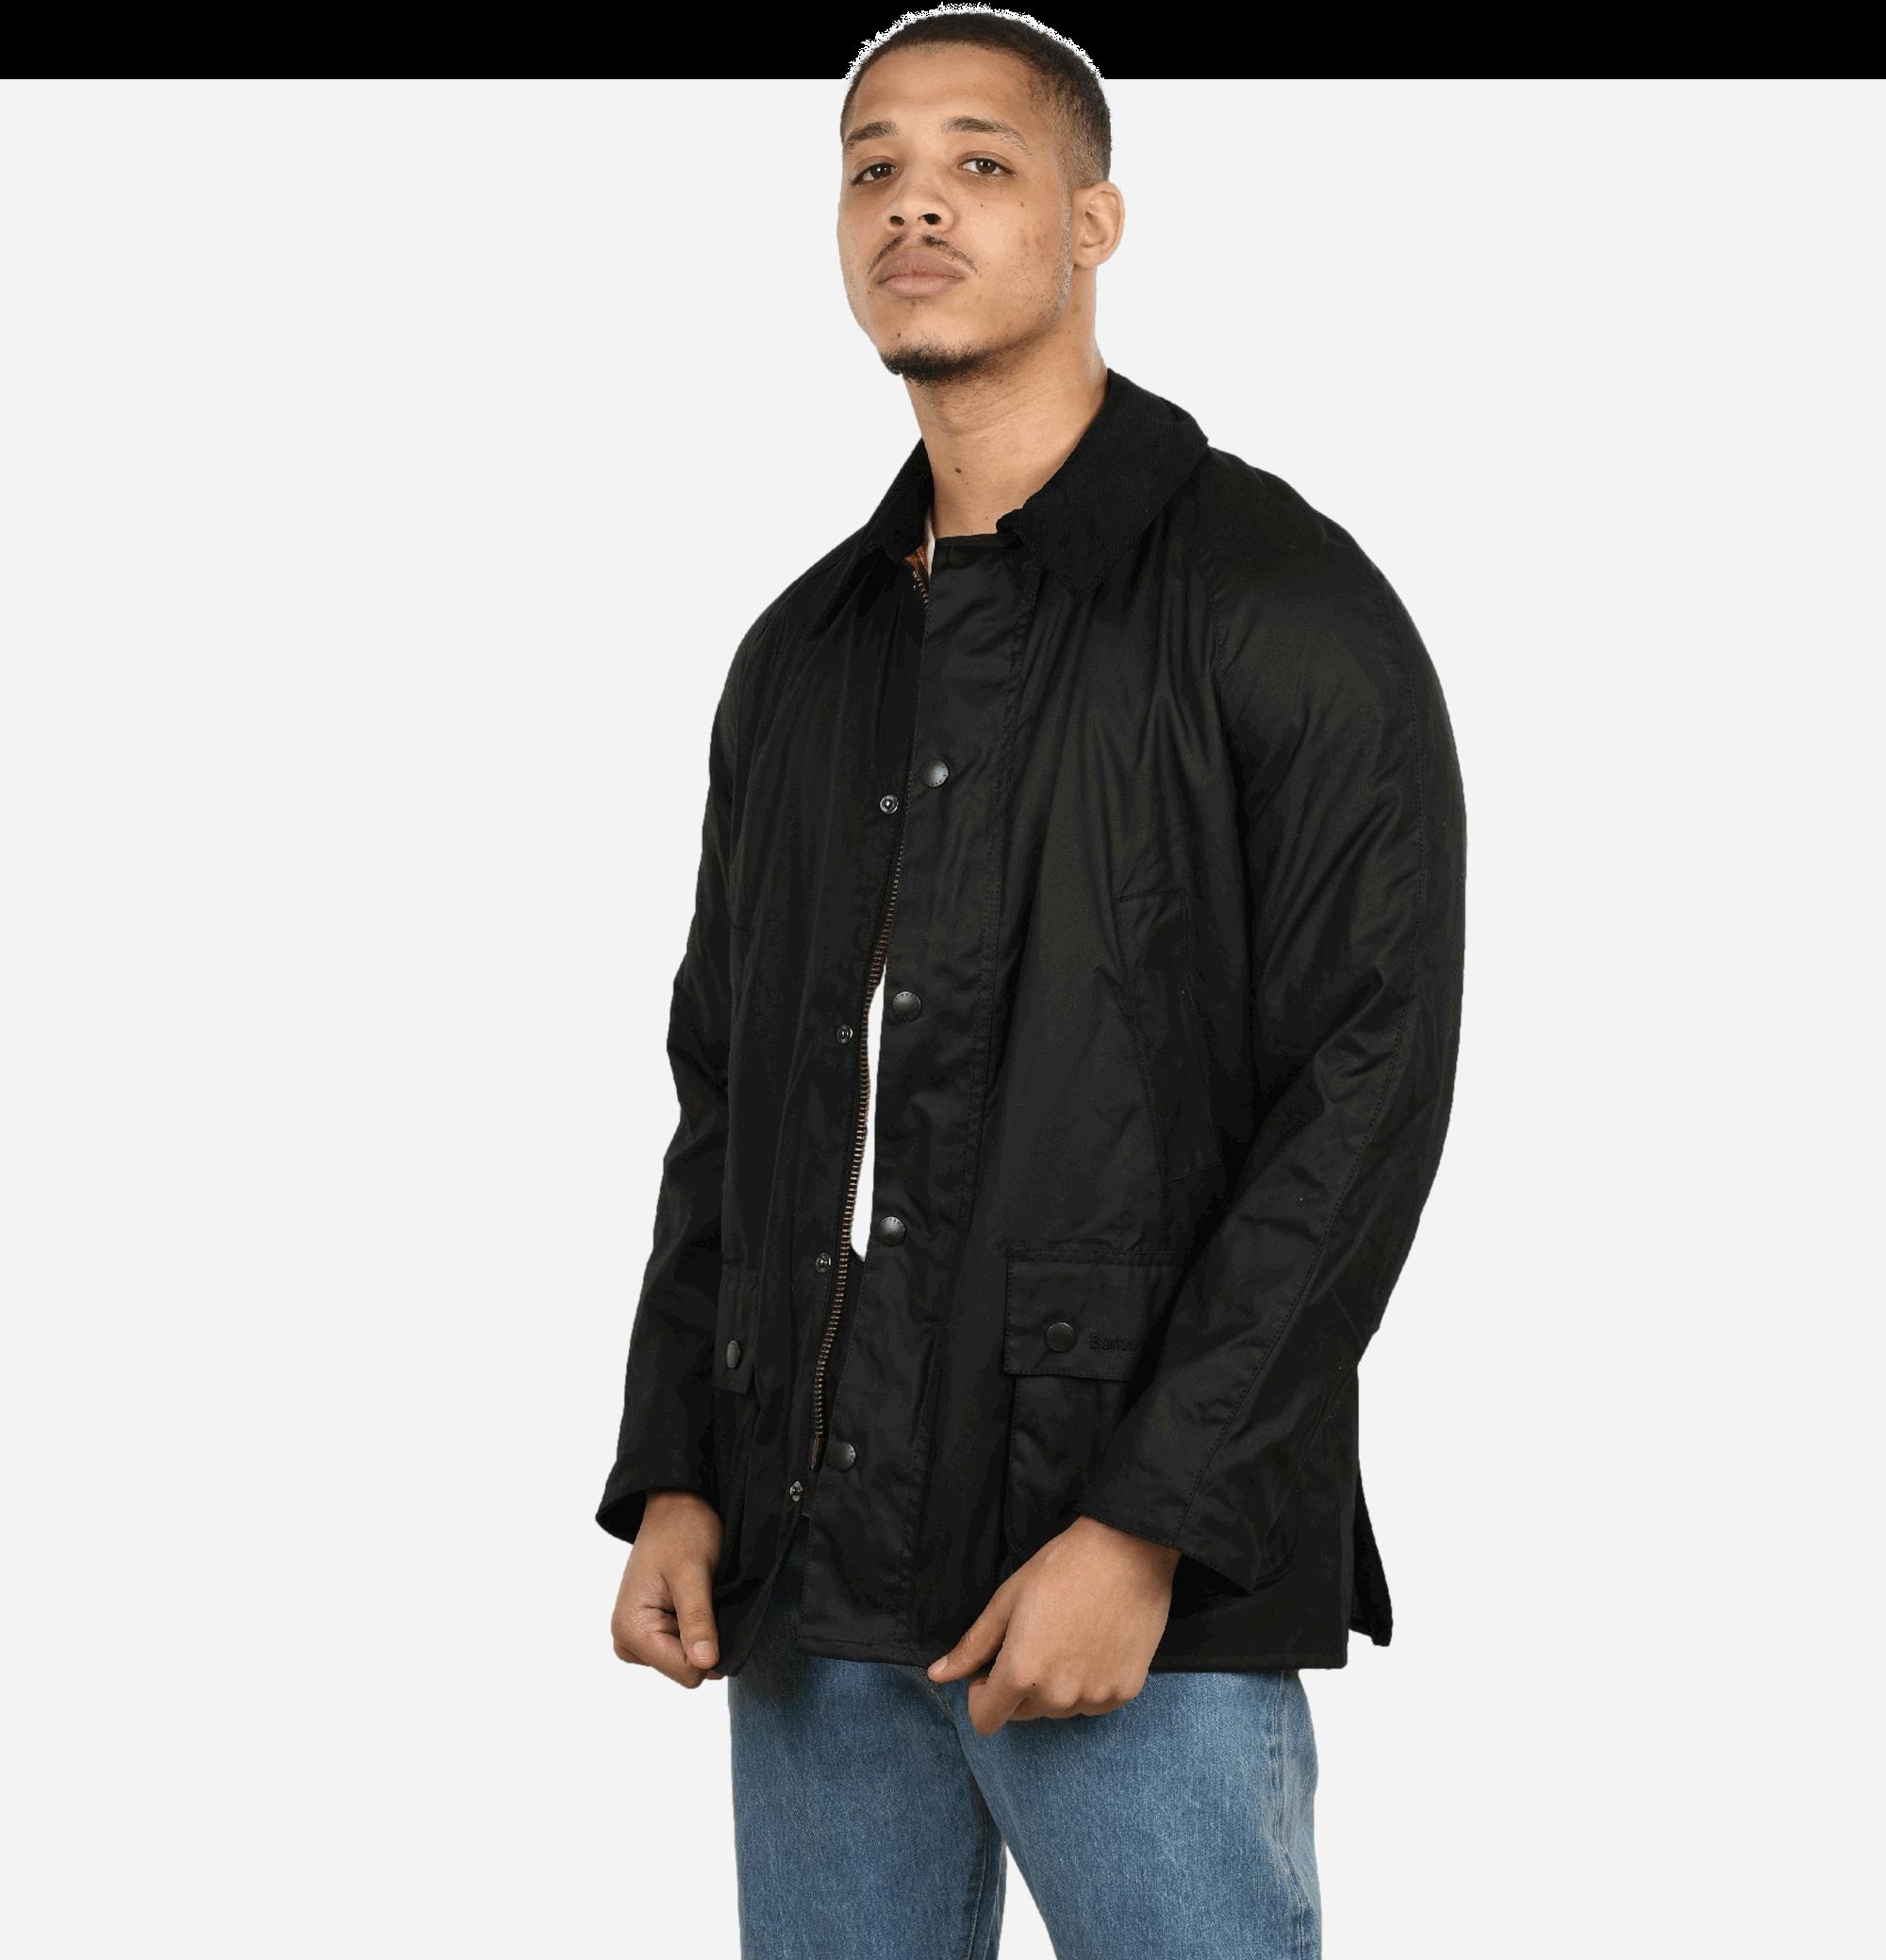 Ashby Jacket Black